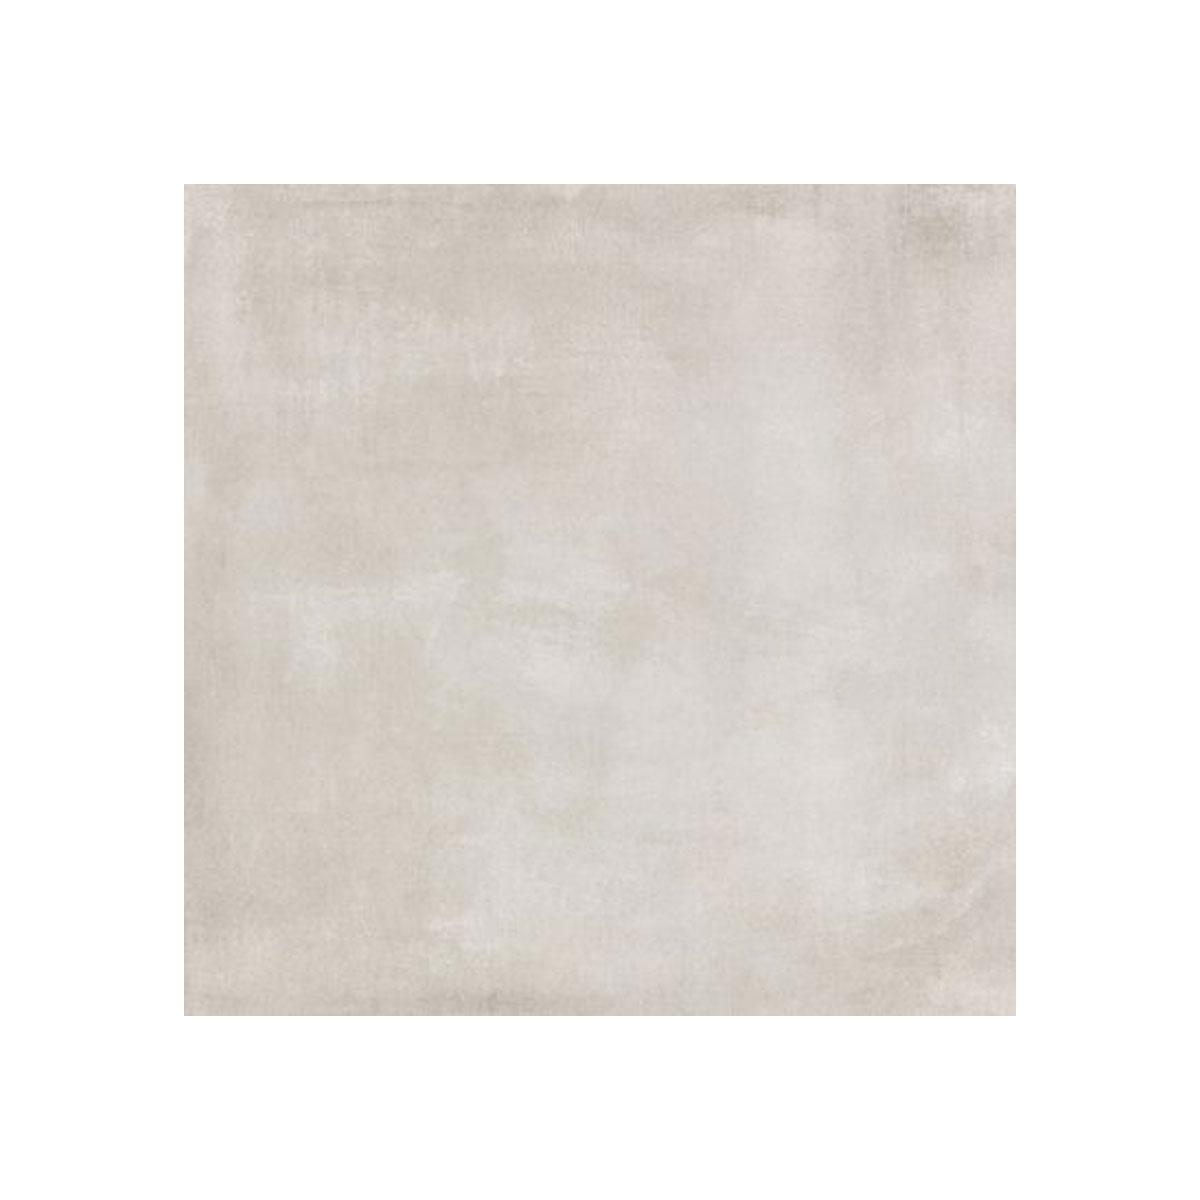 Basic Concrete - Grey - 750x750mm - Concrete Look Tiles - Stone3 Brisbane